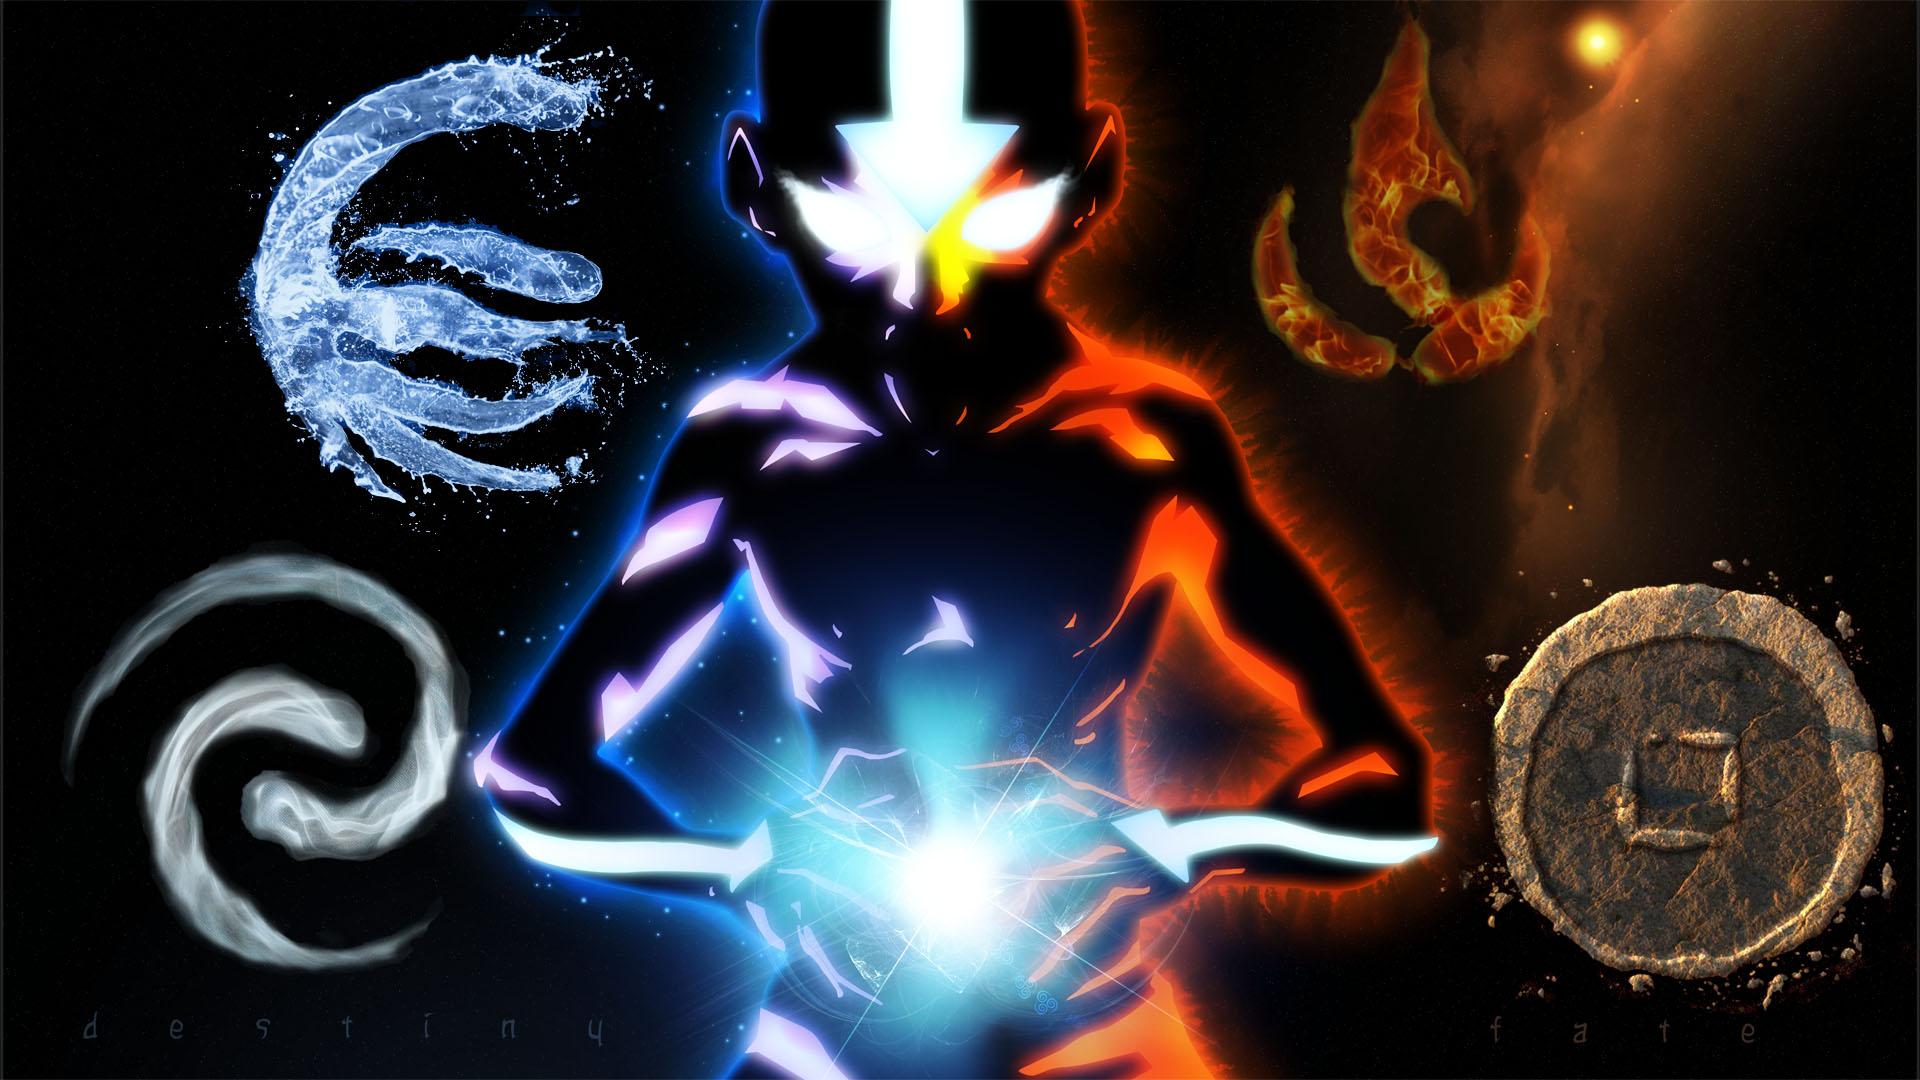 Avatar Aang The Last Airbender Best Wallpaper 9067 Wallpaper 1920x1080